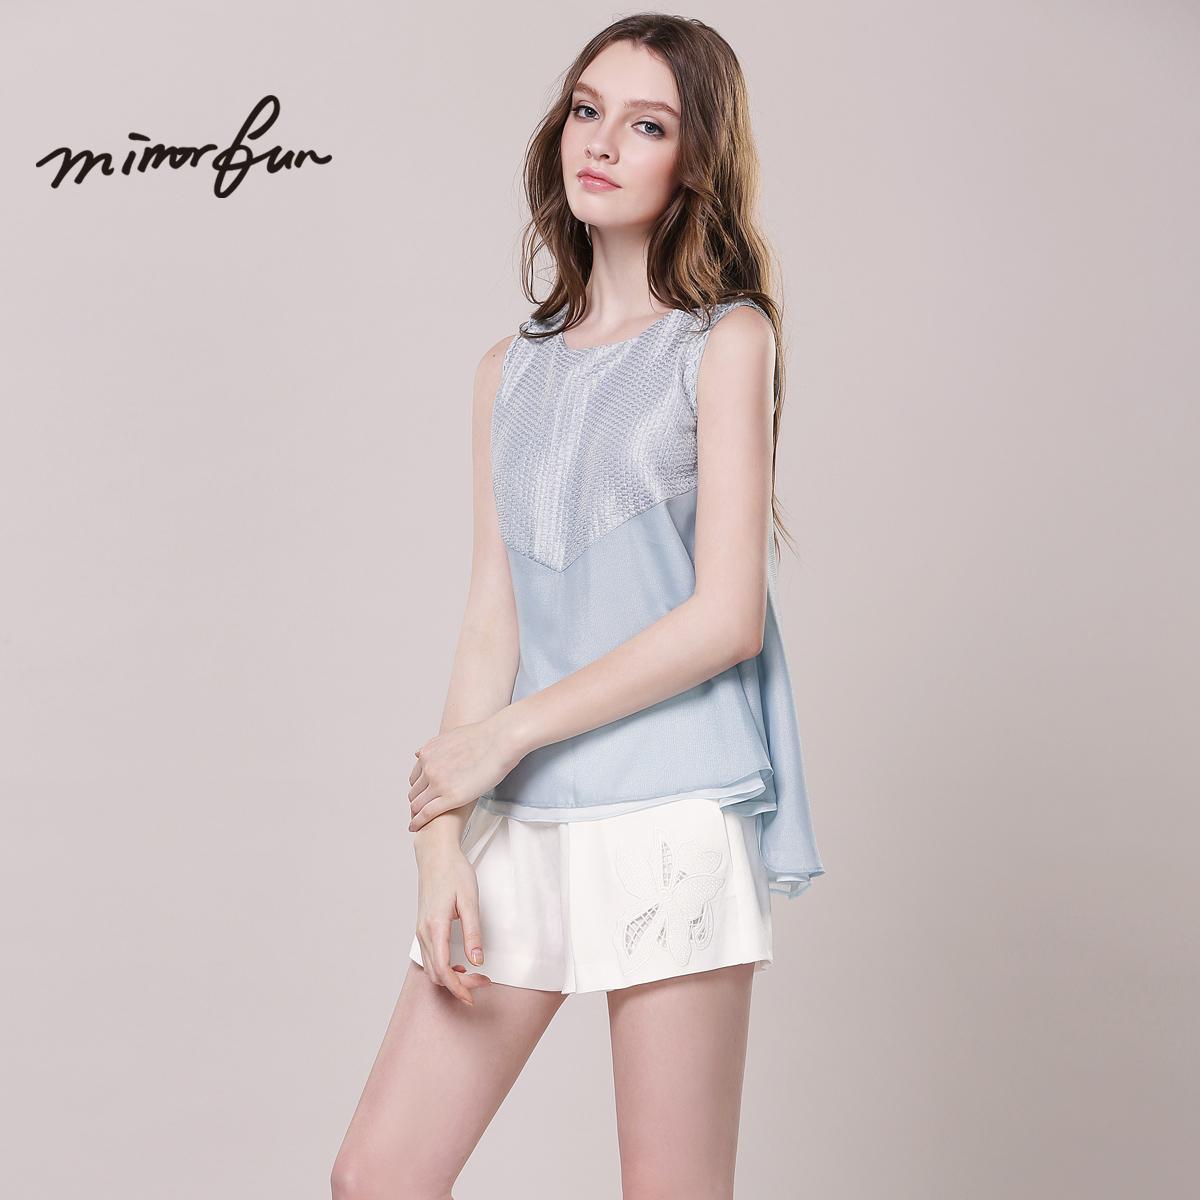 MIRROR FUN2015夏装新款透视拼接无袖雪纺衫拼接雪纺上衣夏宽松